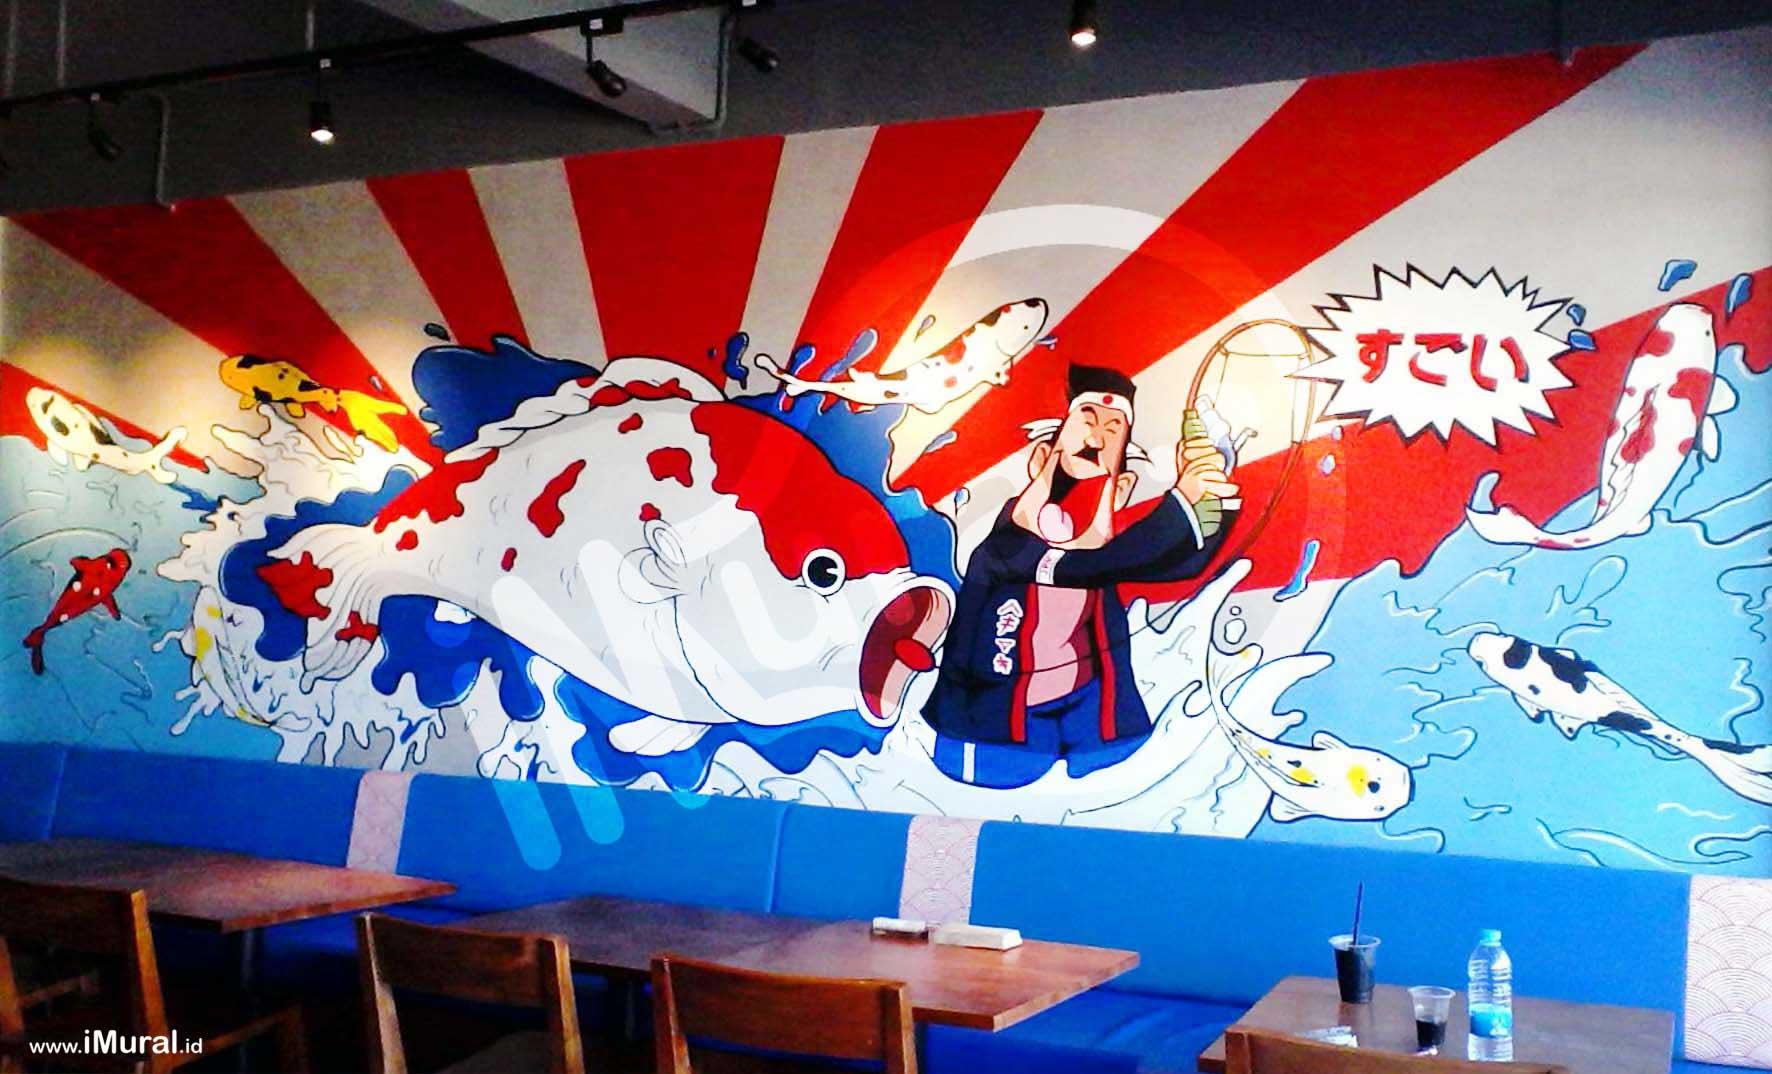 Mural at japanese restaurant imural for Mural indonesia